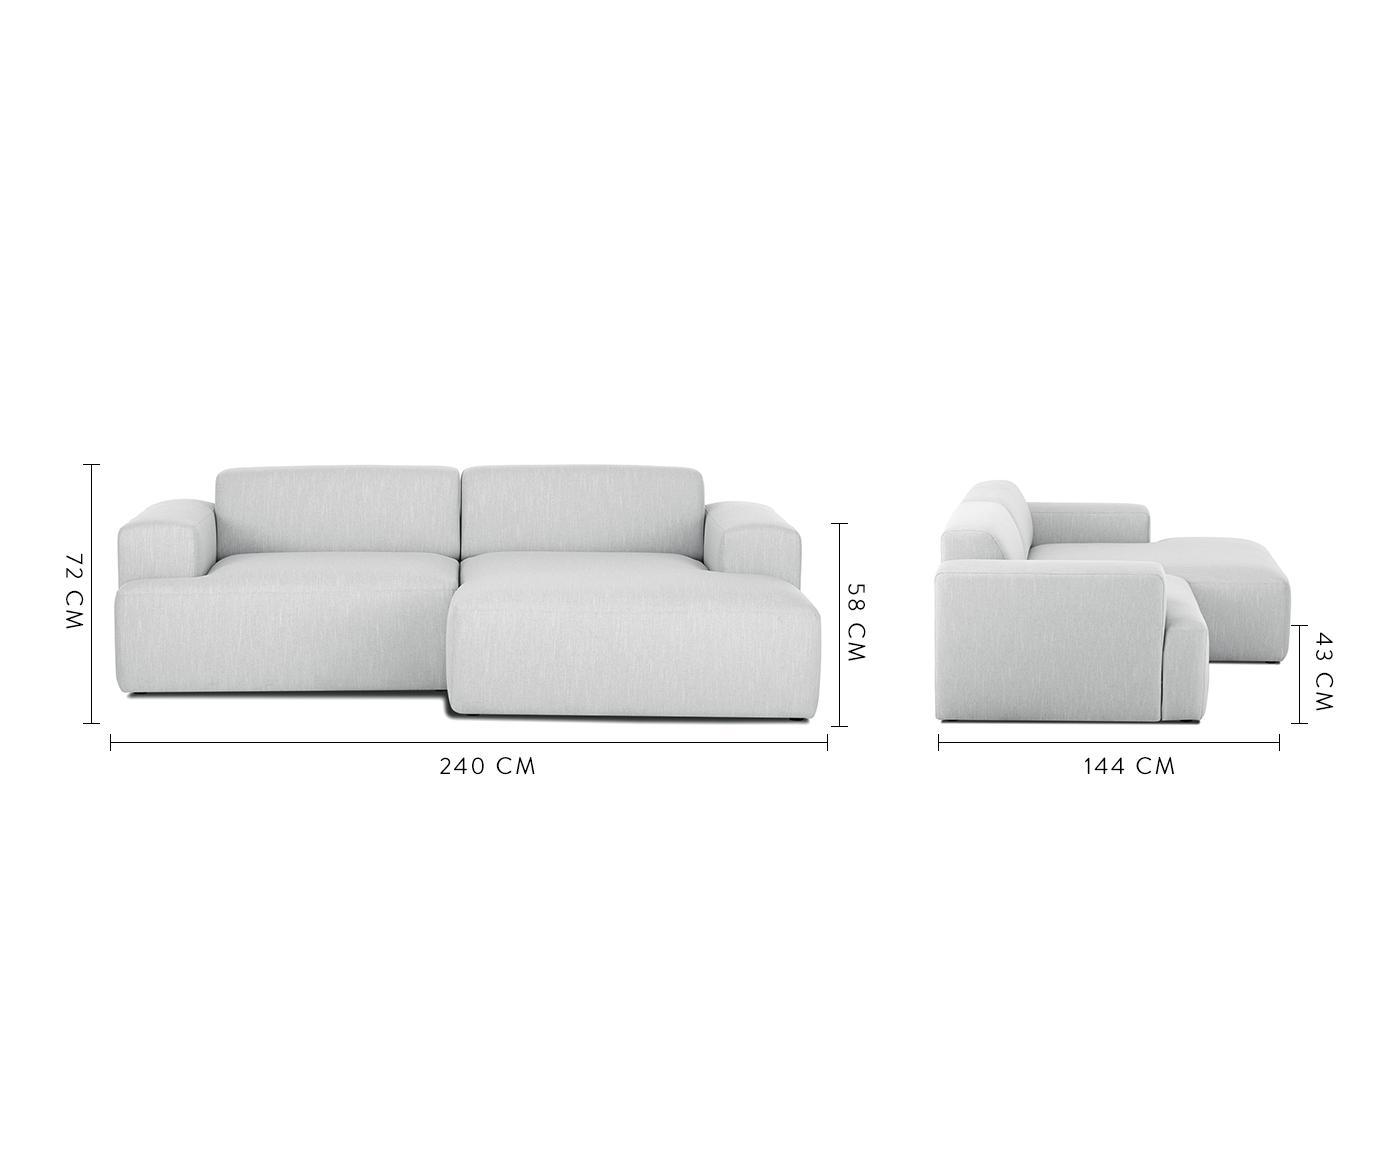 Ecksofa Melva (3-Sitzer), Bezug: Polyester Der hochwertige, Gestell: Massives Kiefernholz, Spa, Webstoff Hellgrau, B 240 x T 144 cm